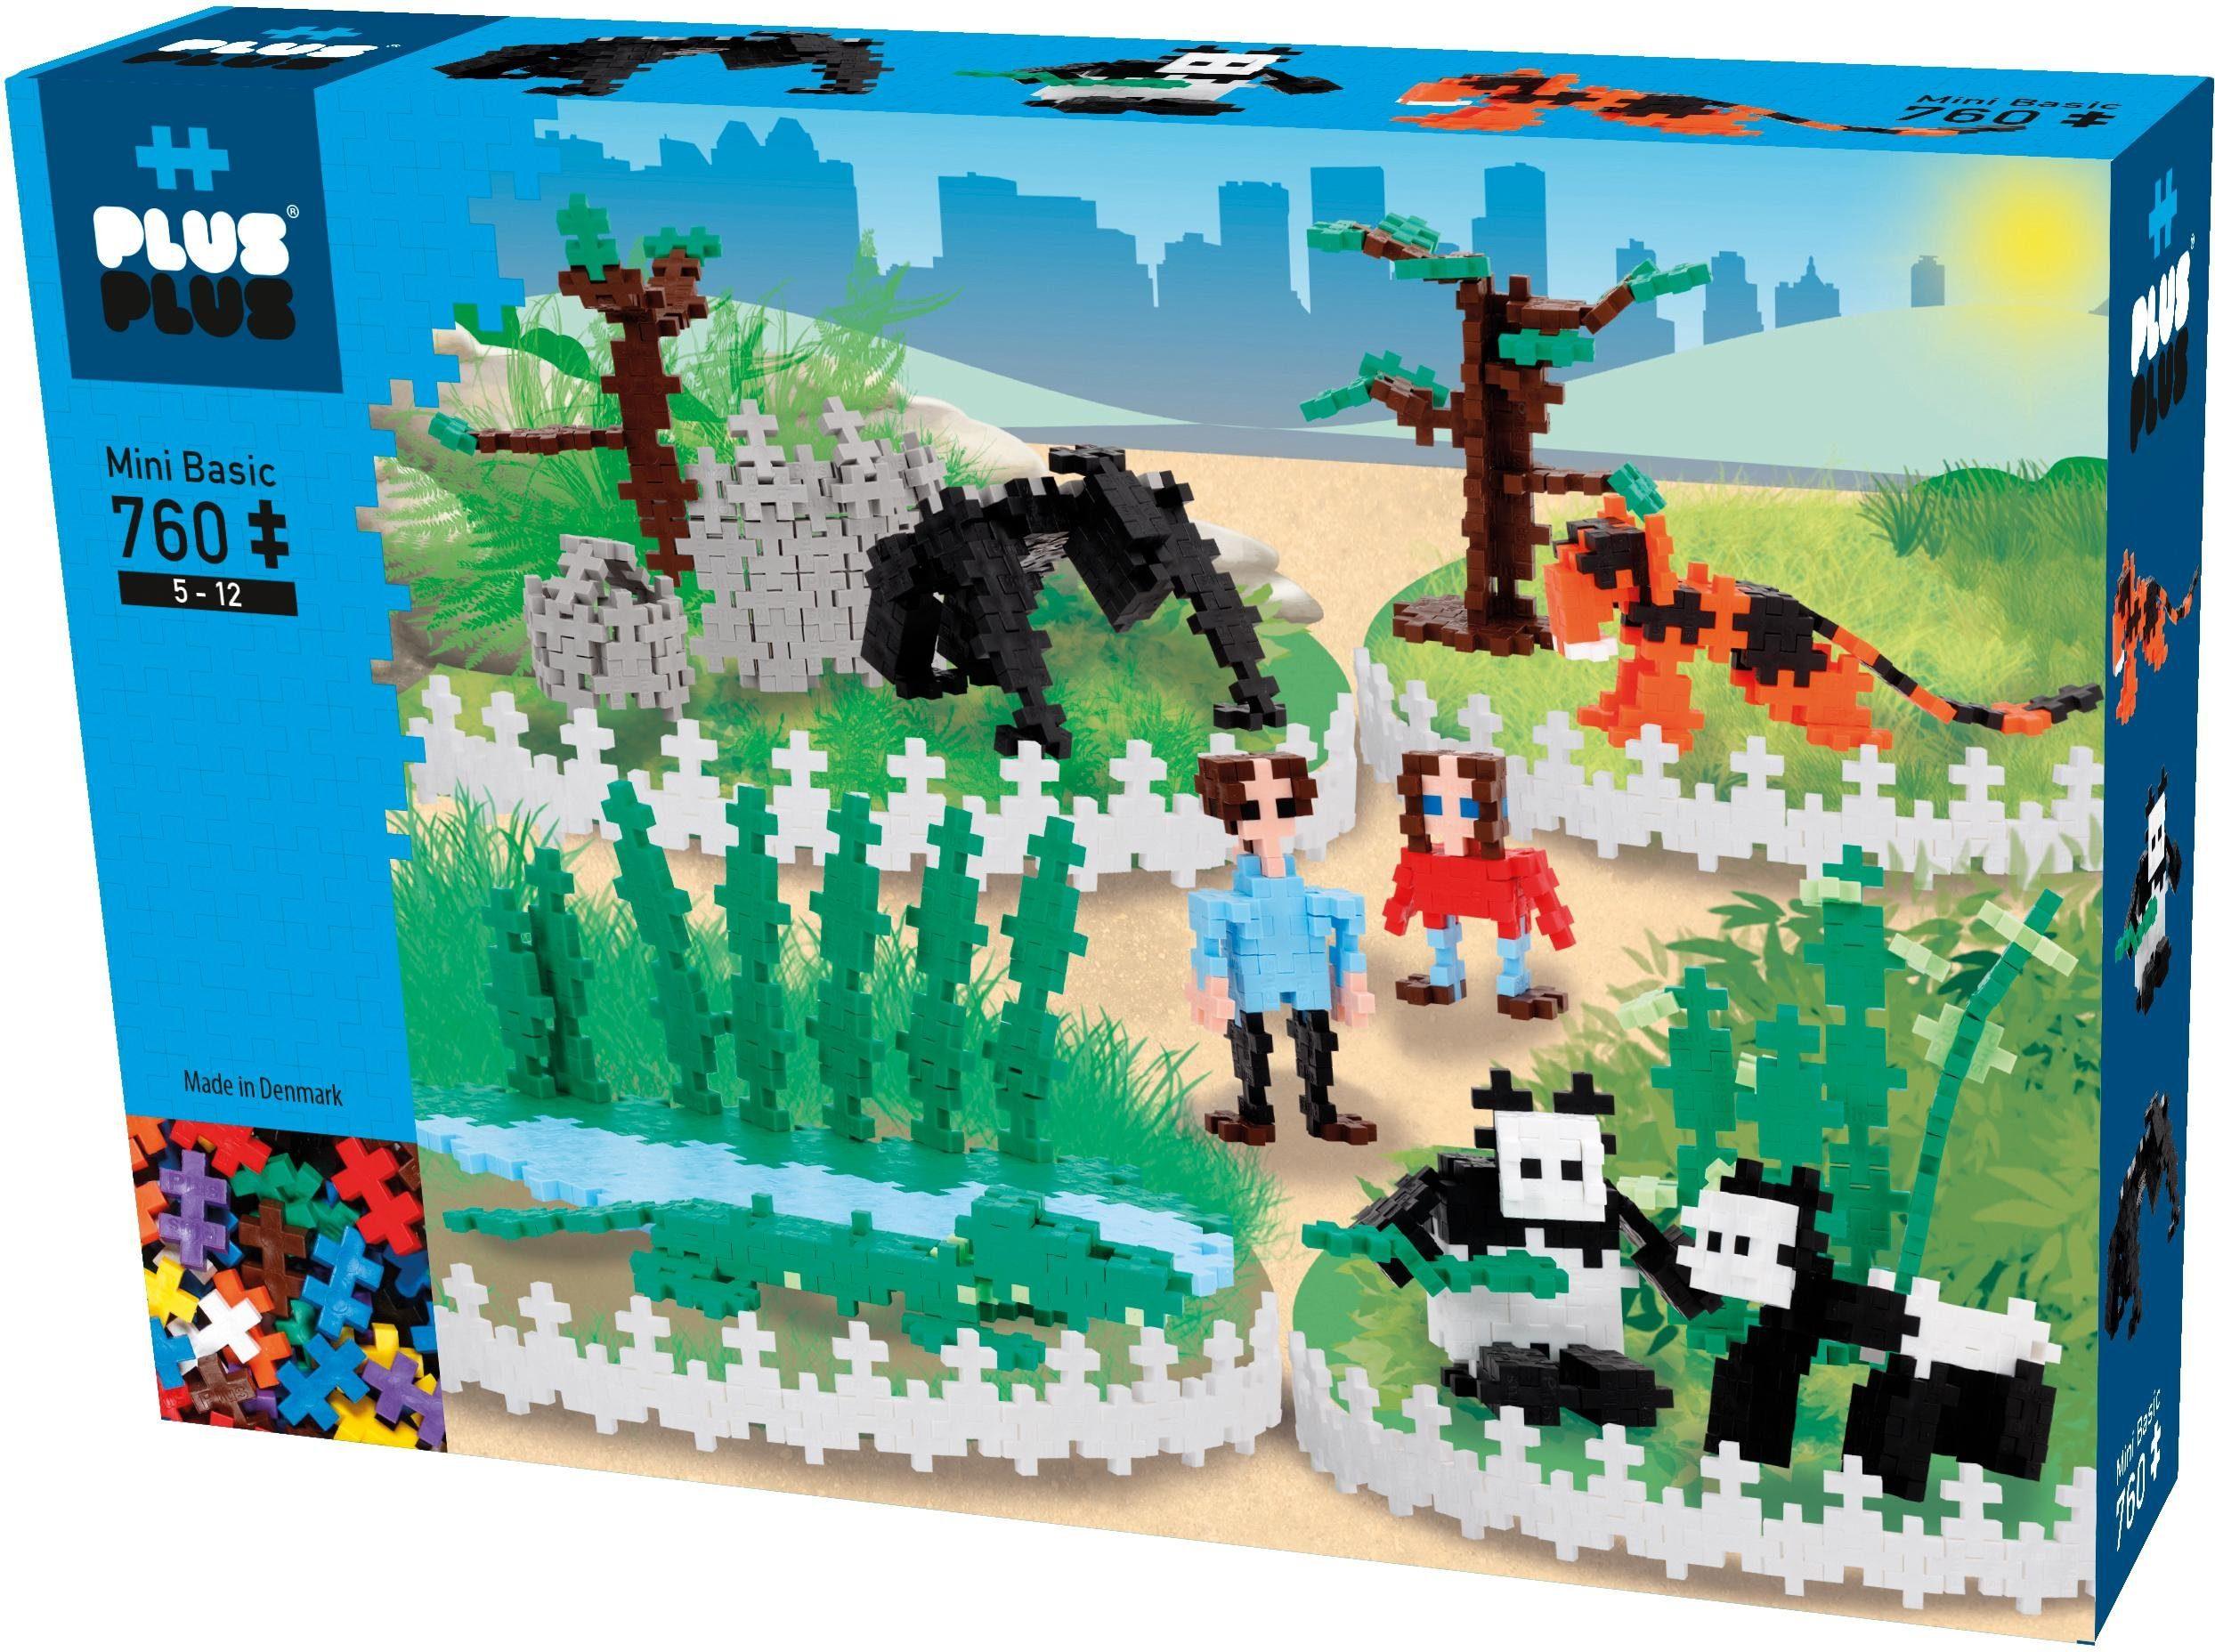 Plus-Plus 3D-Puzzle, 760 Teile, »Mini Basic Zoo«